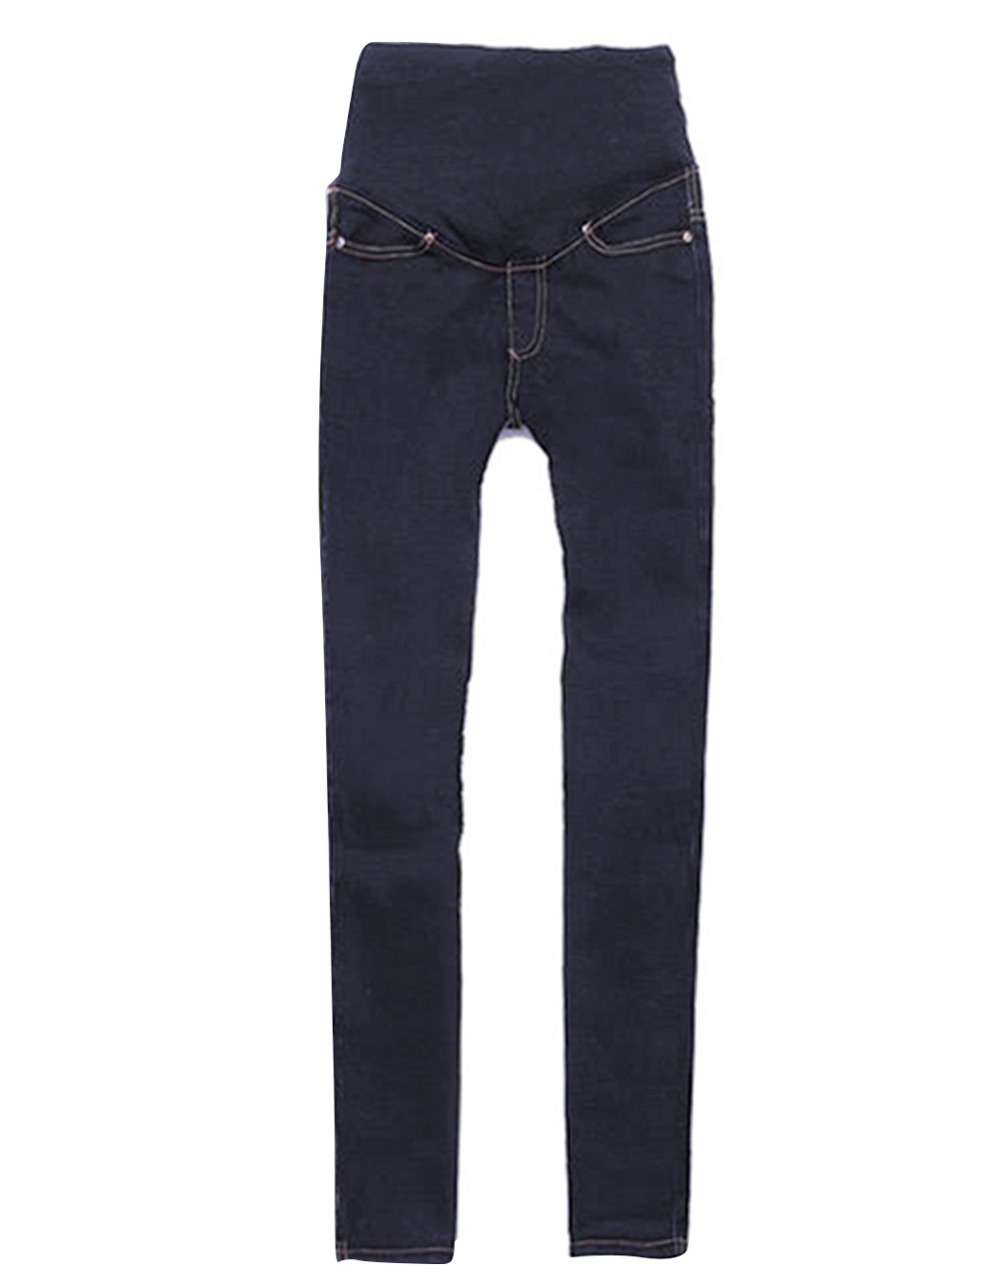 Lady Women Slim Long Pencil Pants Skinny Jean Pants Casual